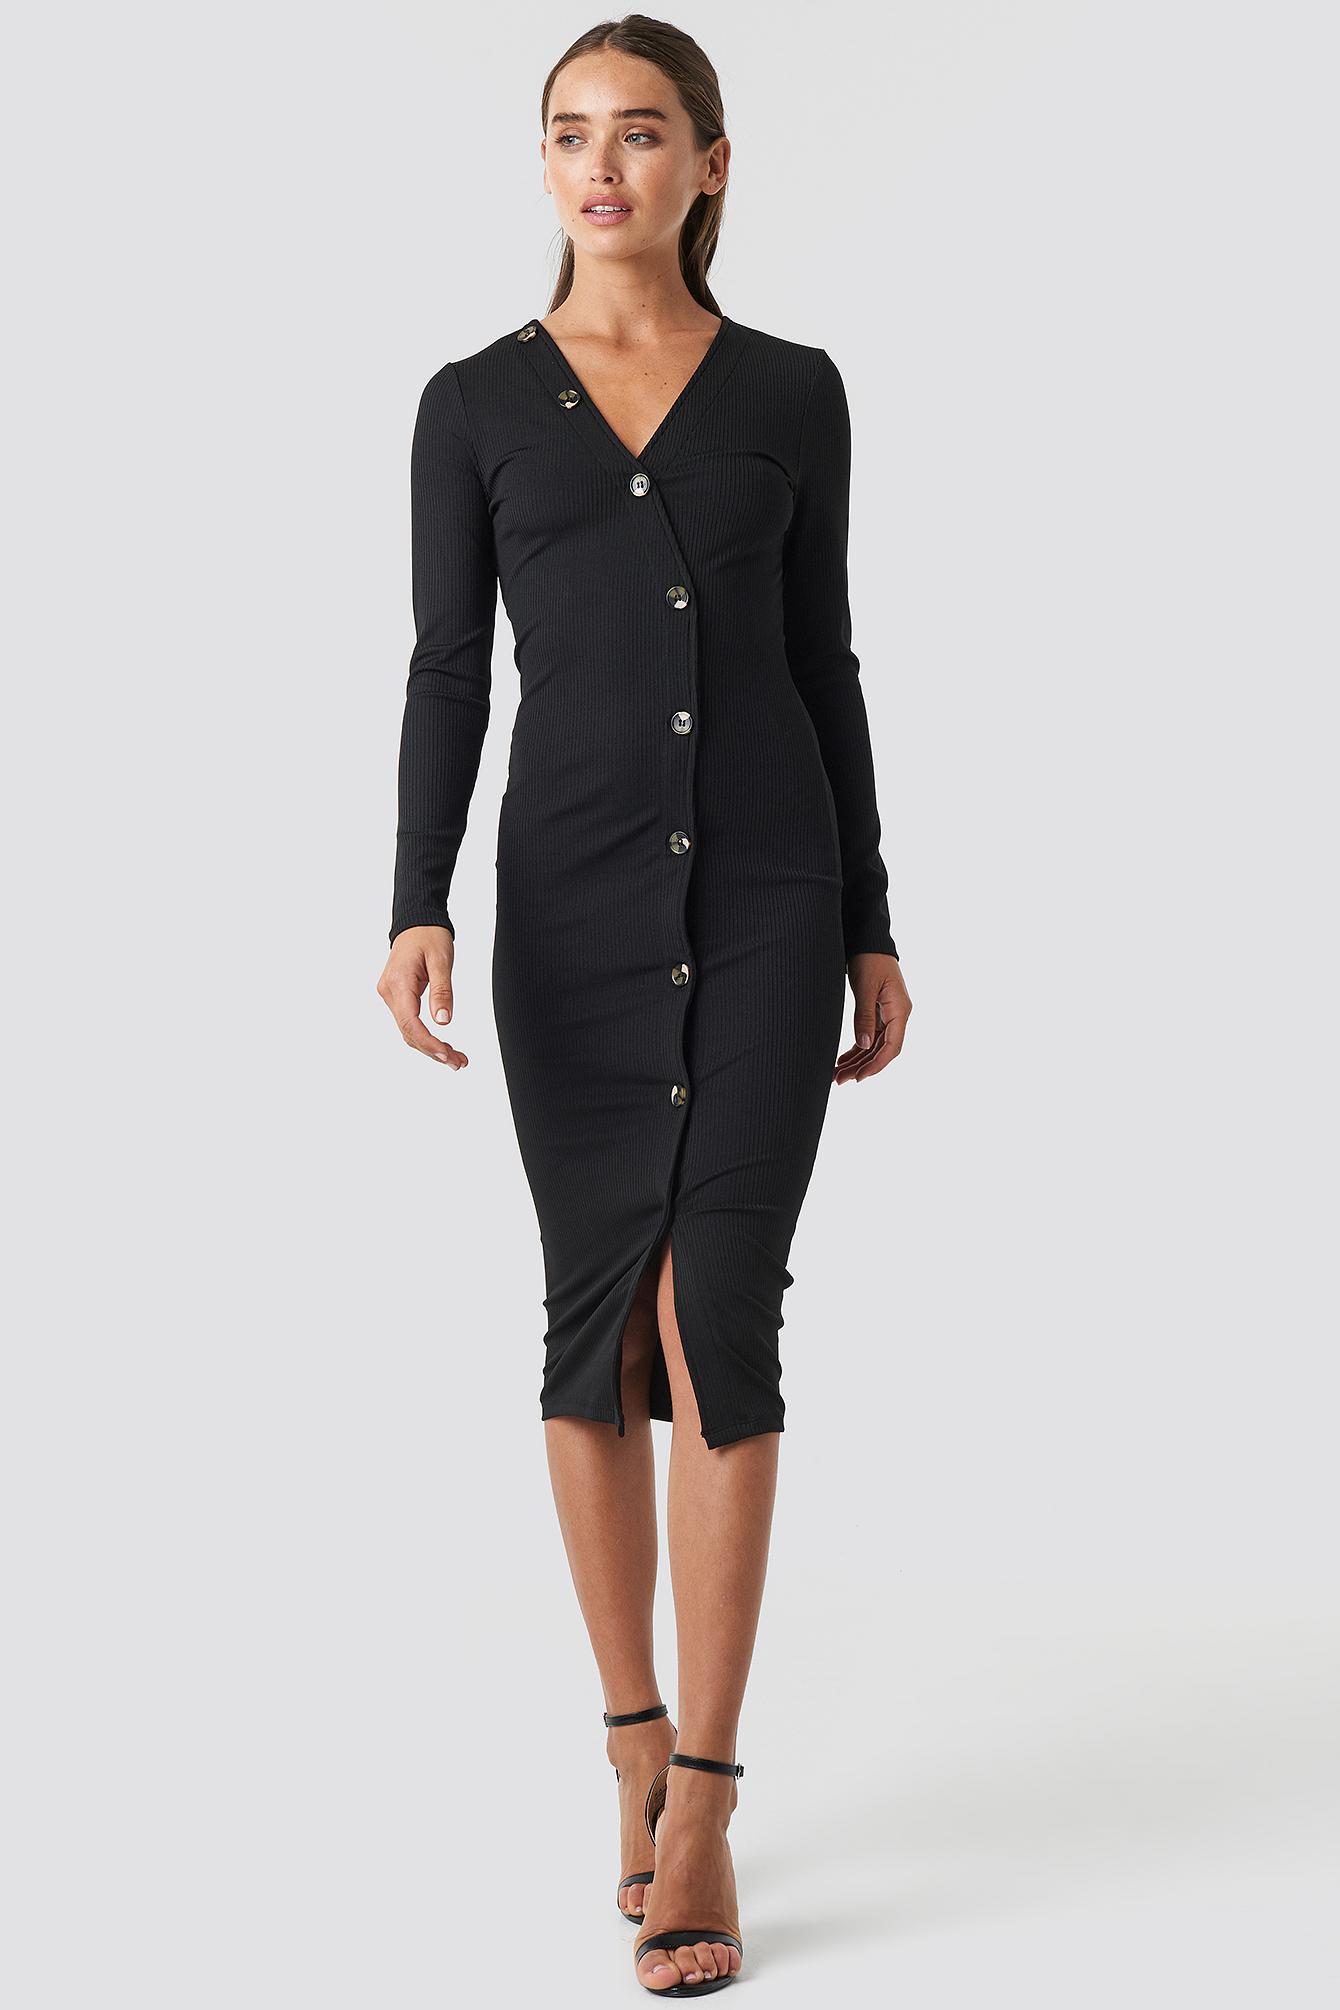 Button Dress,ribbed dress,button dress,button dress,